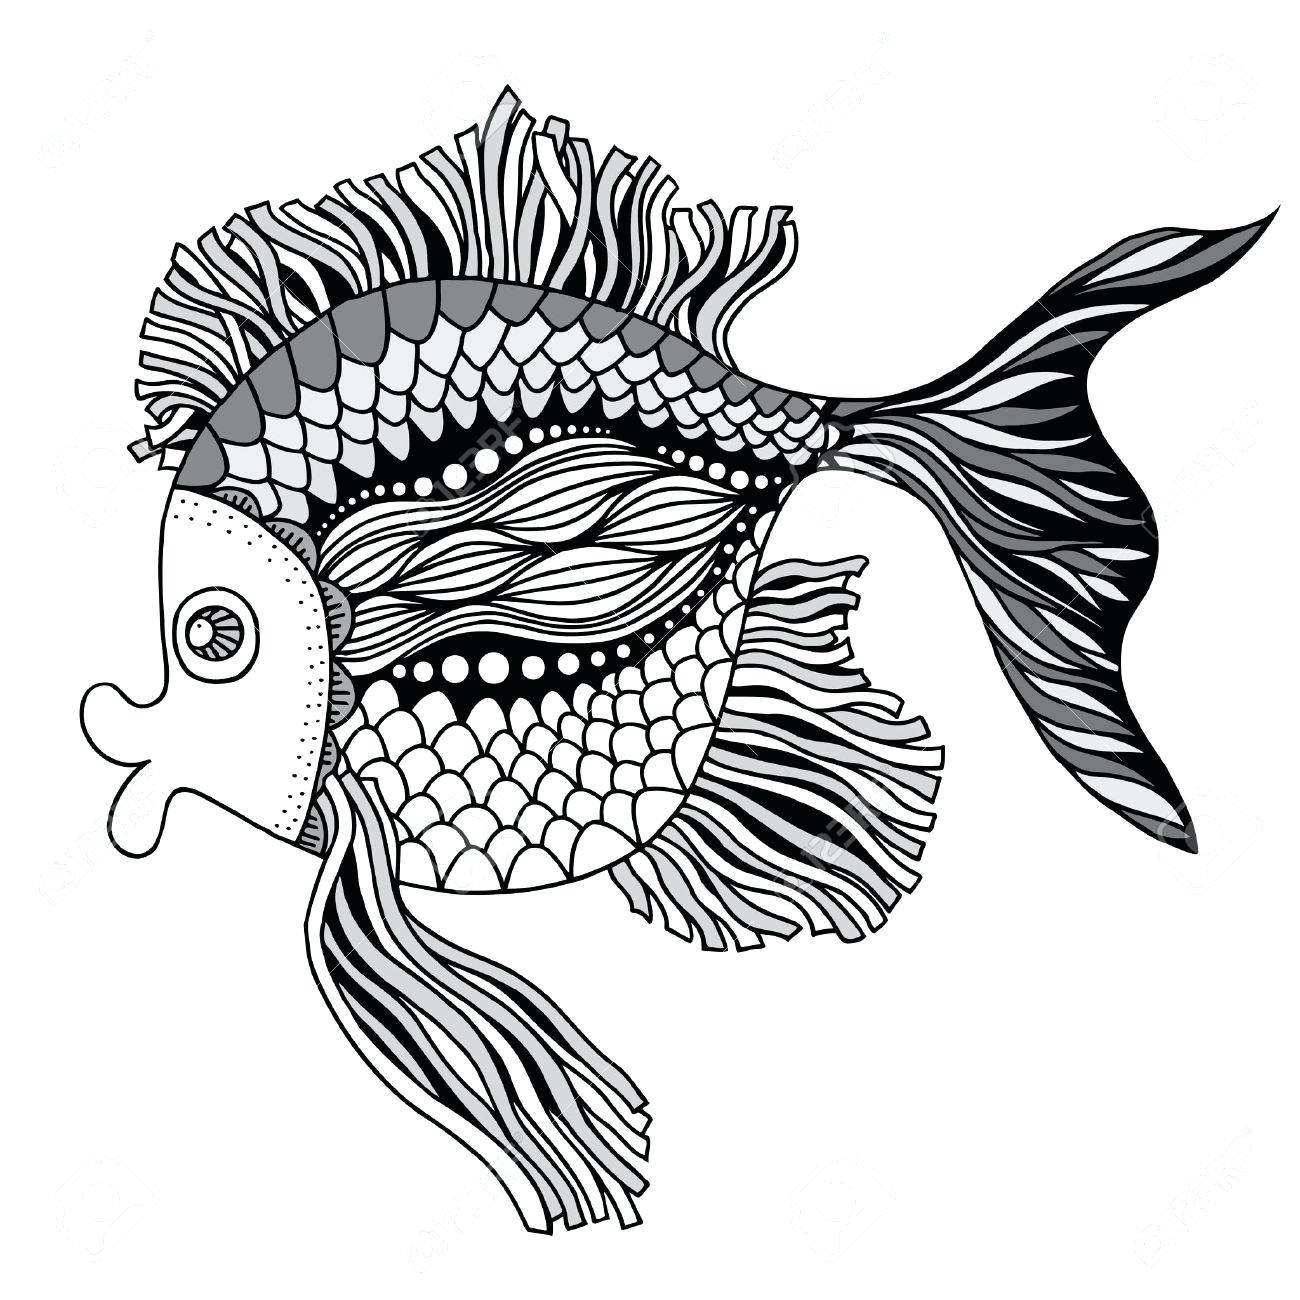 Koi Fish Drawing Outline At Getdrawings